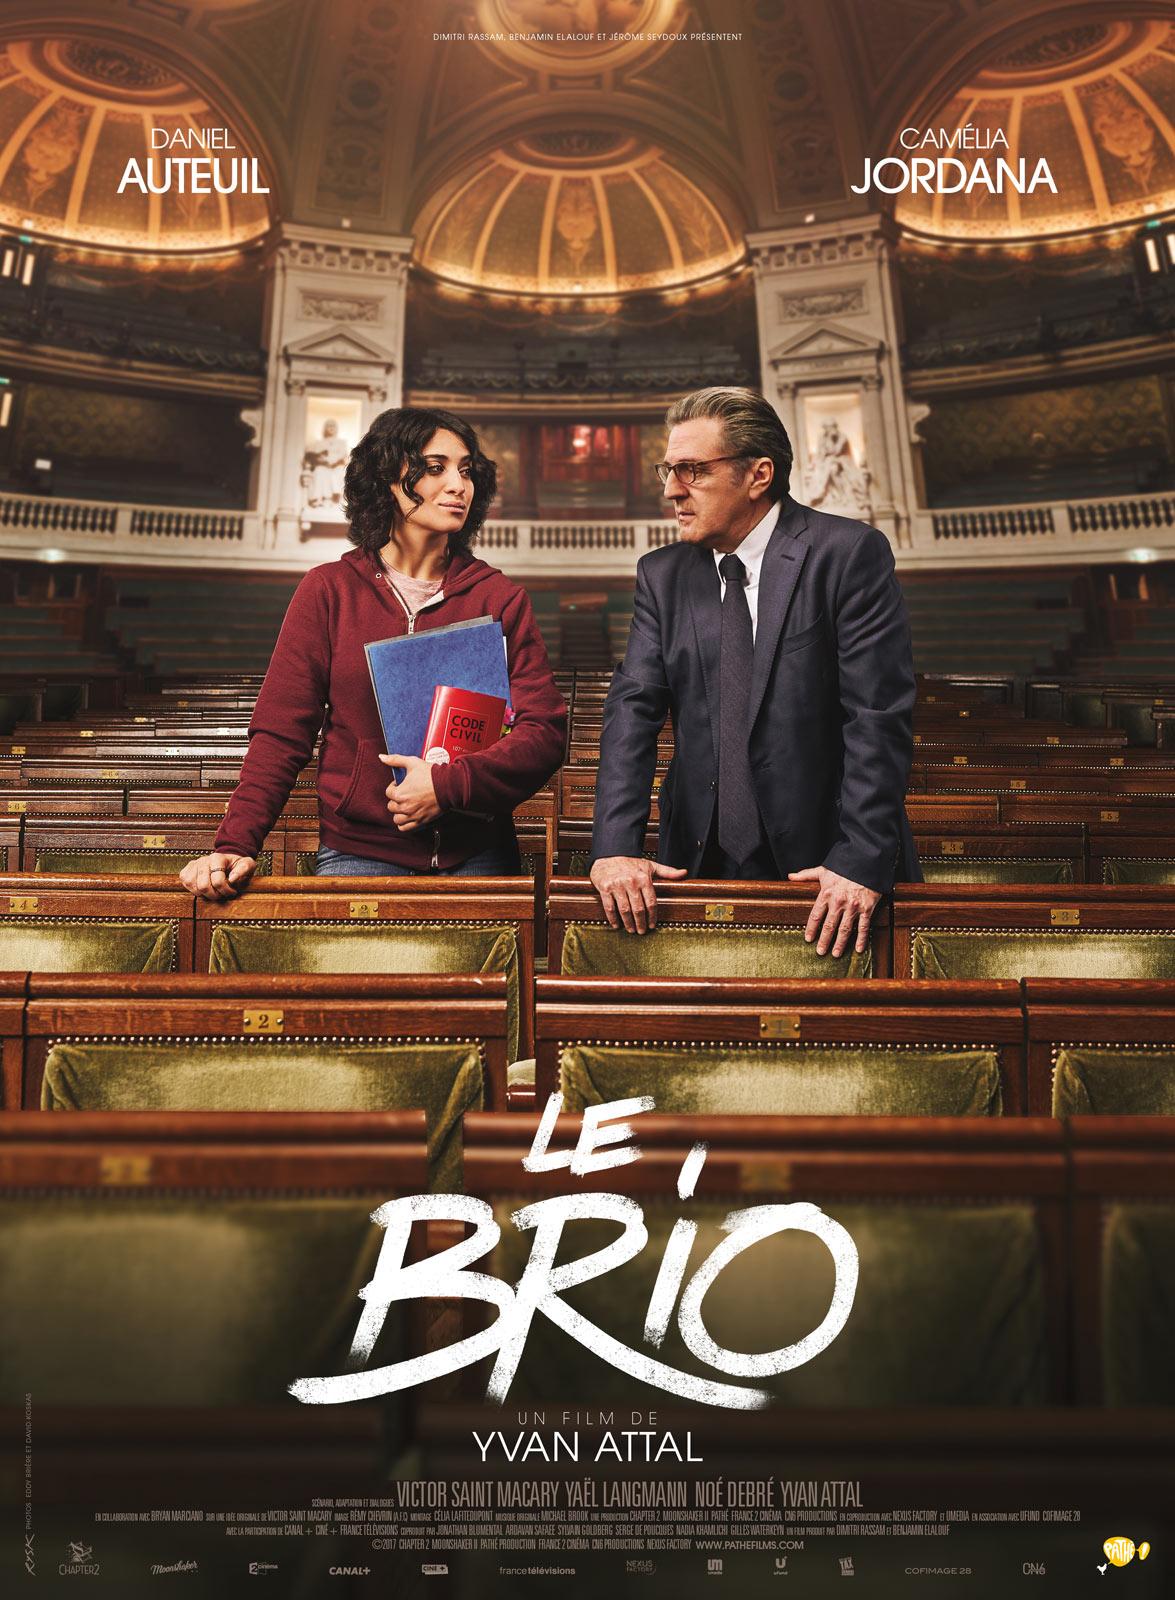 Extrem Le Brio - film 2017 - AlloCiné SJ73